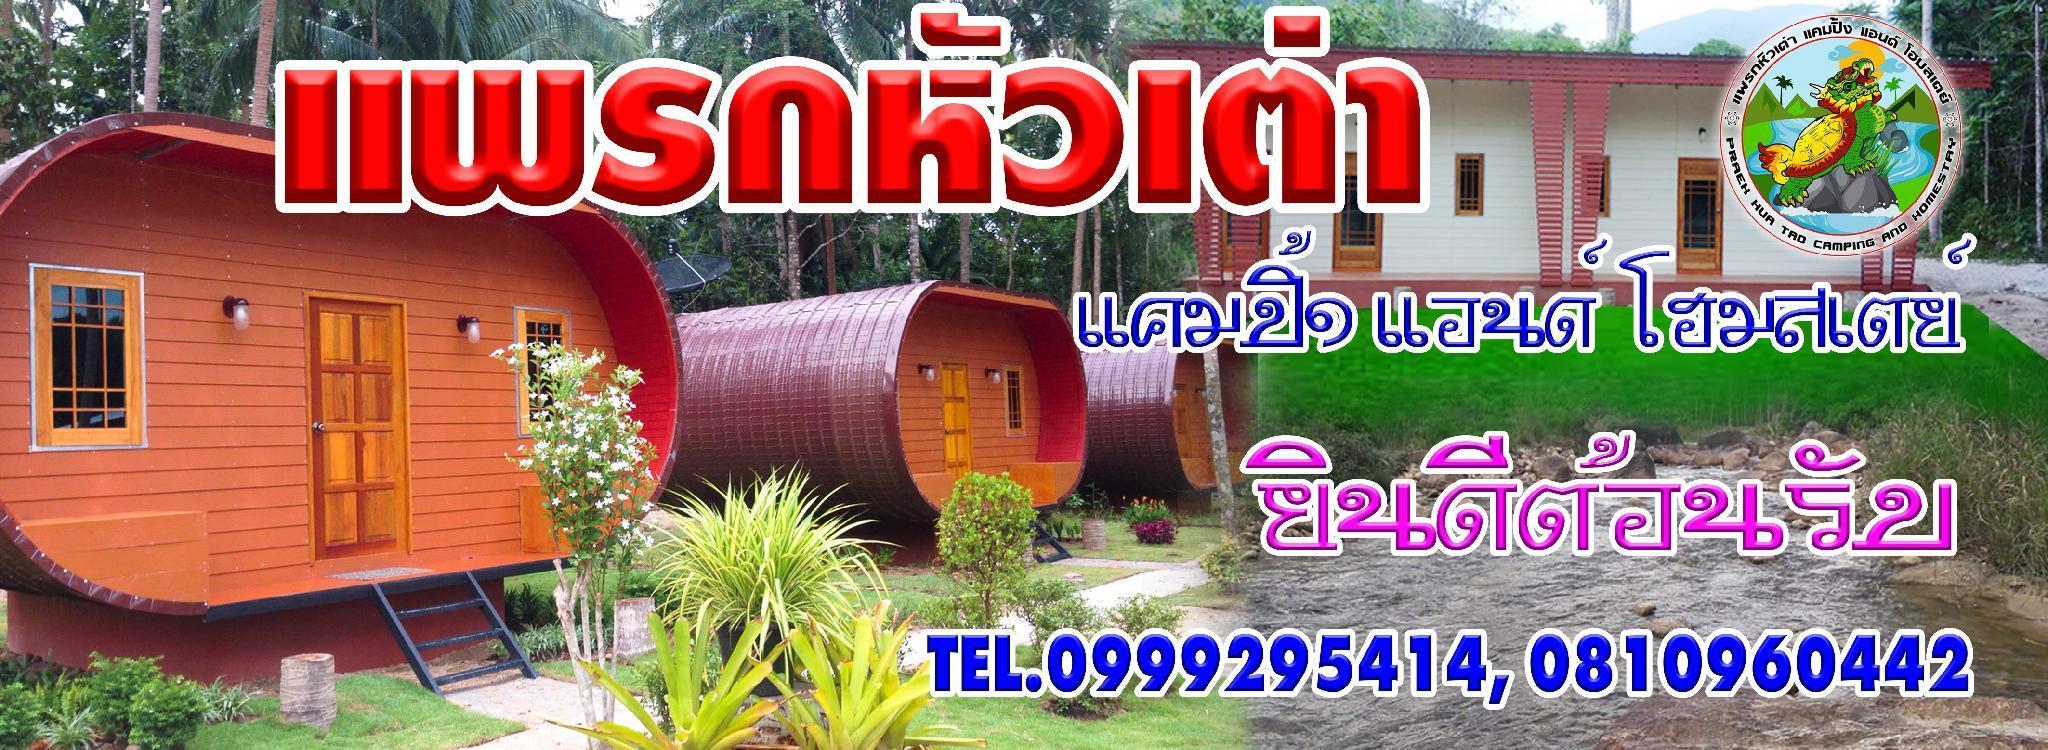 Preak Hua Tao Camping And Homestay